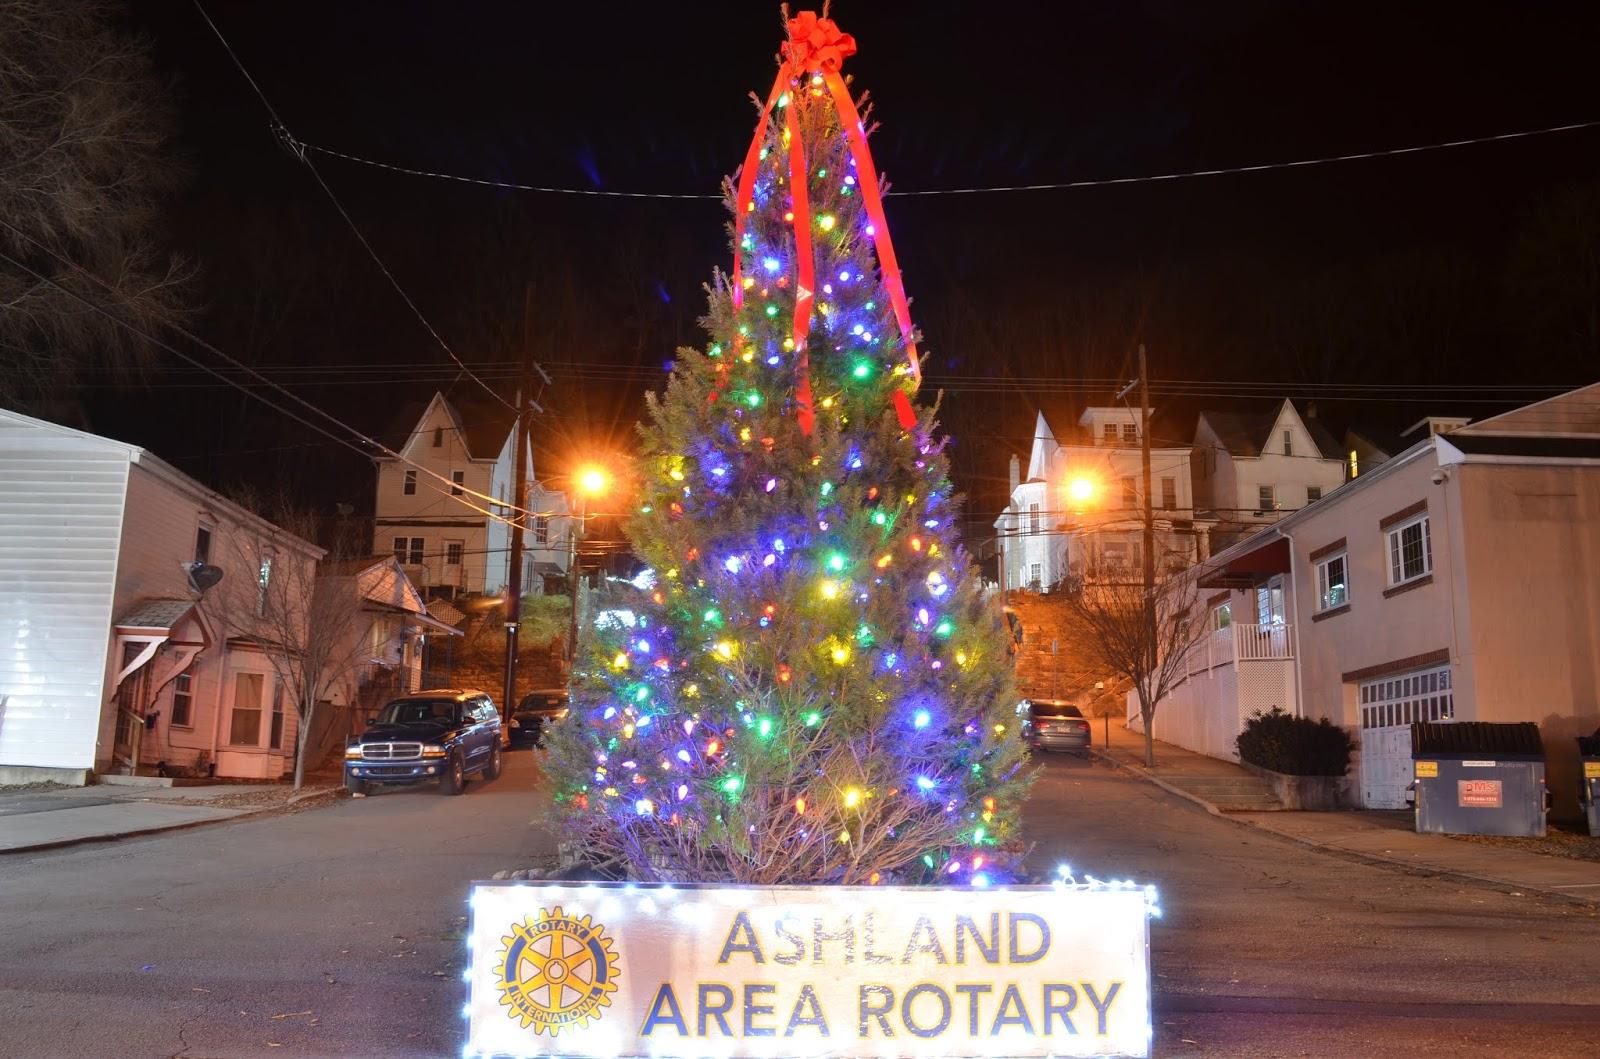 Ashland Christmas Trees.Skook News Ashland Area Rotary Purchases Borough Christmas Tree